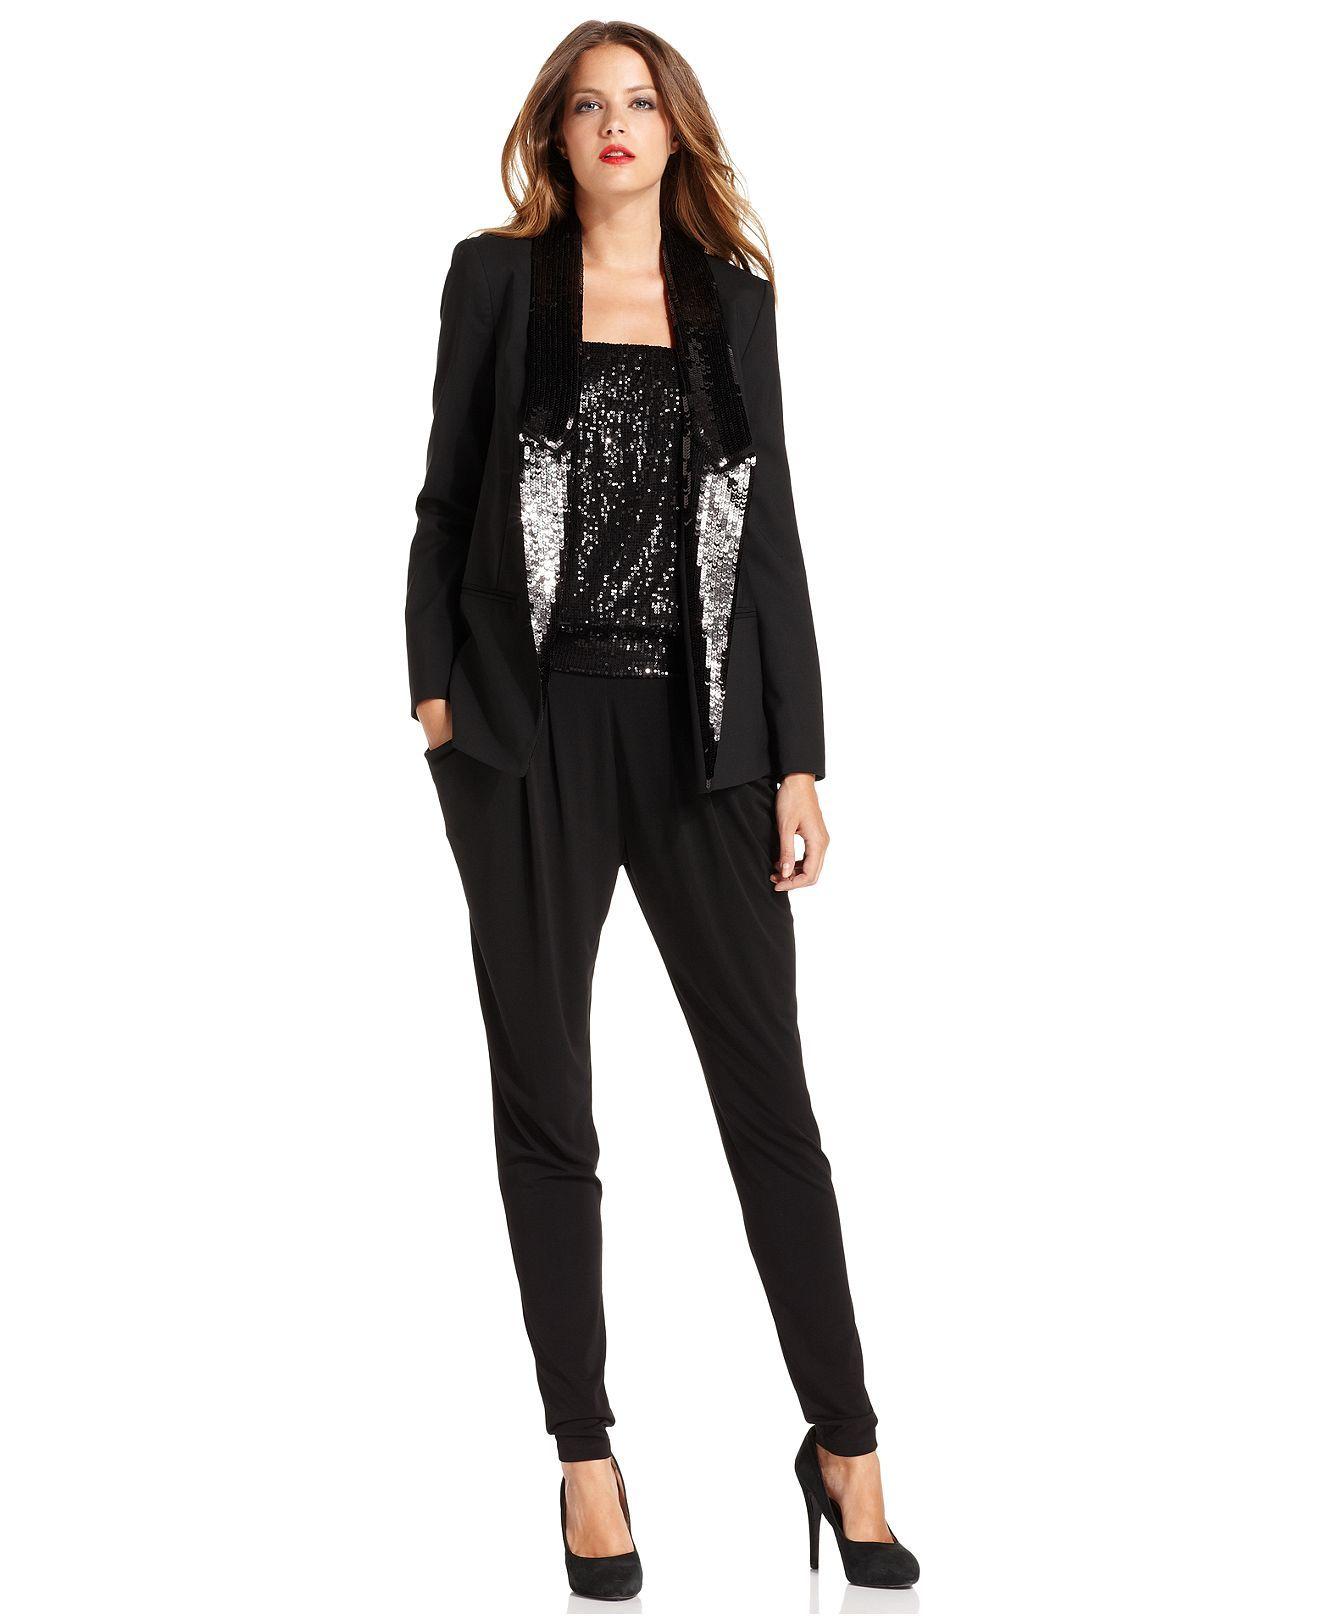 8fc5d0eef8 MICHAEL Michael Kors Sequined Tuxedo Blazer, Strapless Sequin Blouson &  Skinny Pleated Pants - Womens Tuxedo Luxe - Macy's